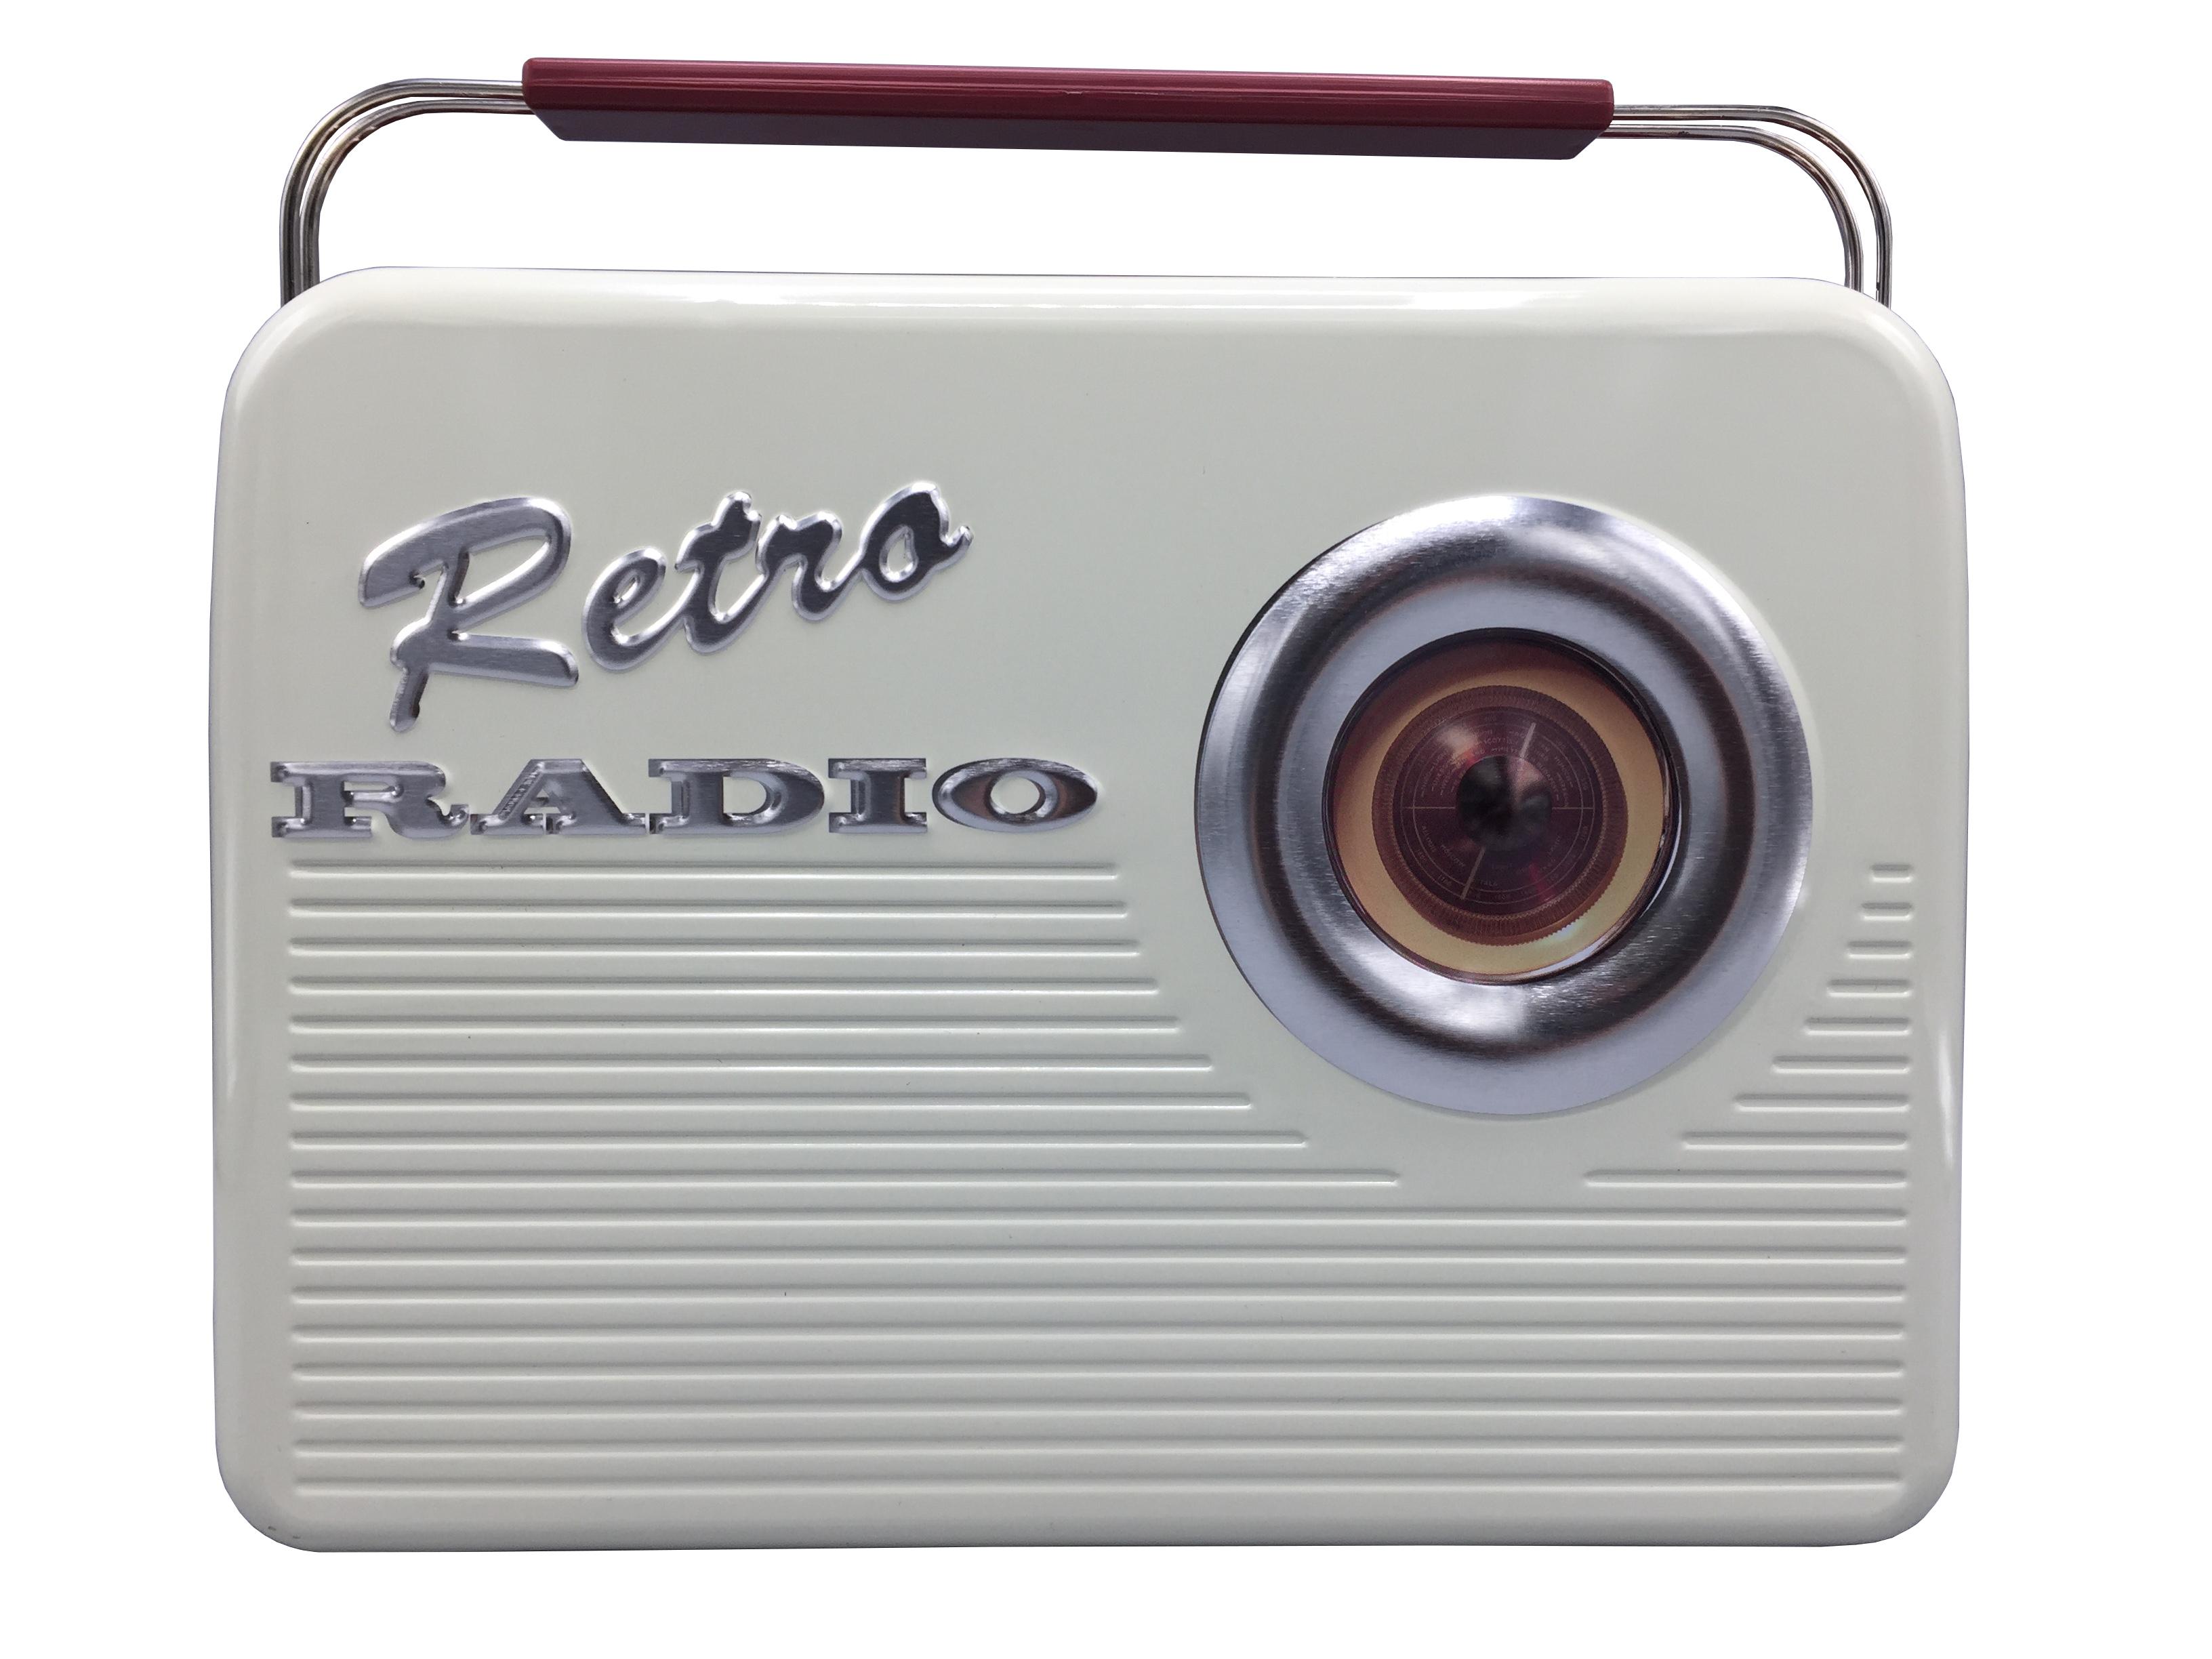 10410 Retro Radio beige